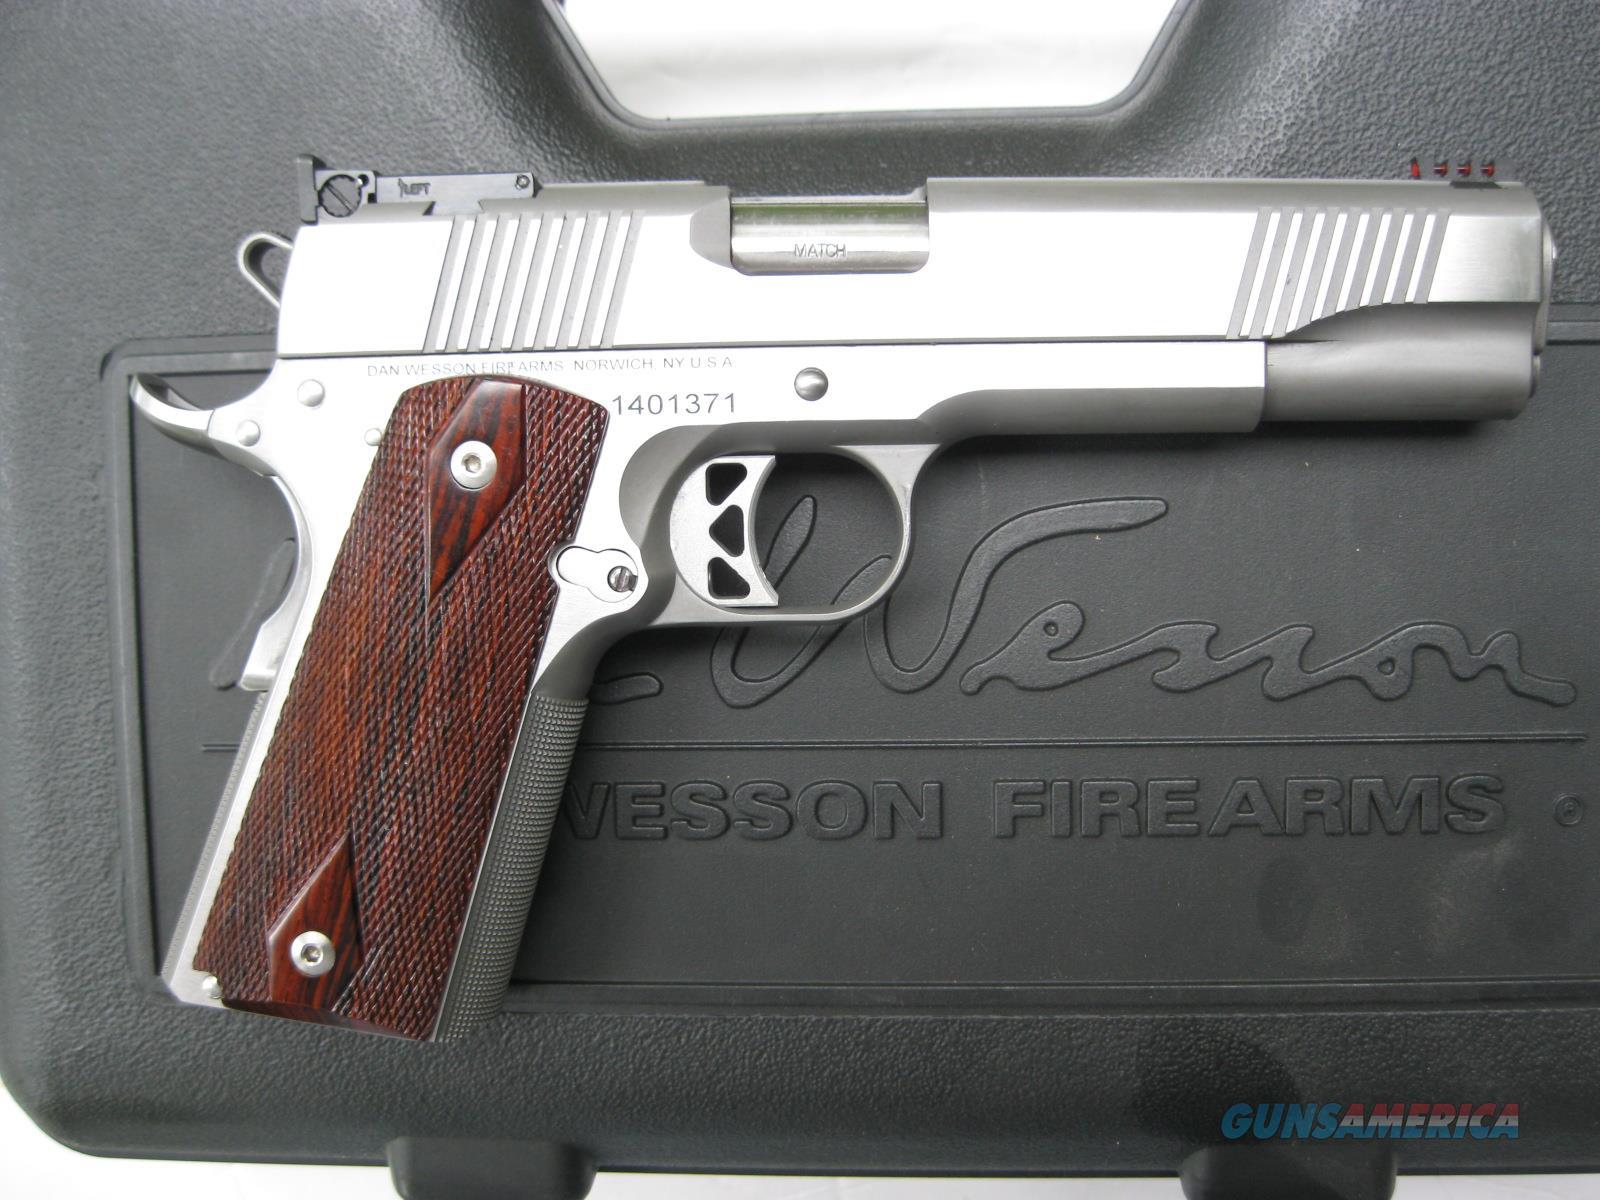 "Dan Wesson PM9 Pointman 9mm 5"" 1911 Stainless Fiber Optic 01909  Guns > Pistols > Dan Wesson Pistols/Revolvers > 1911 Style"